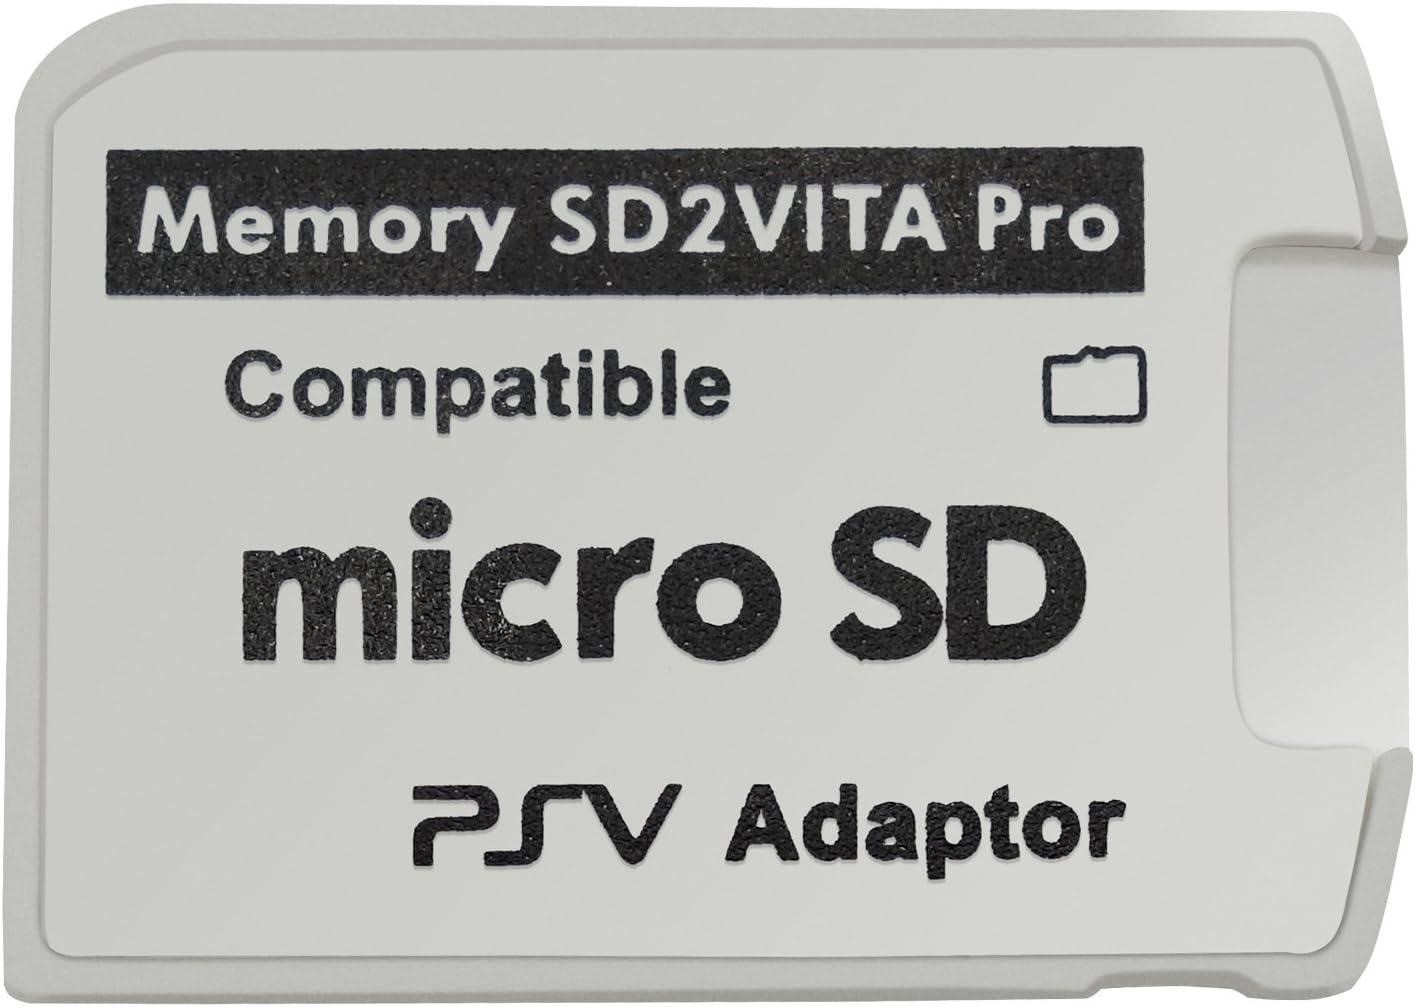 Funturbo Ultimate Version SD2Vita 5.0 Memory Card Adapter, PS Vita PSVSD Micro SD Adapter PSV 1000/2000 PSTV FW 3.60 HENkaku Enso System: Electronics